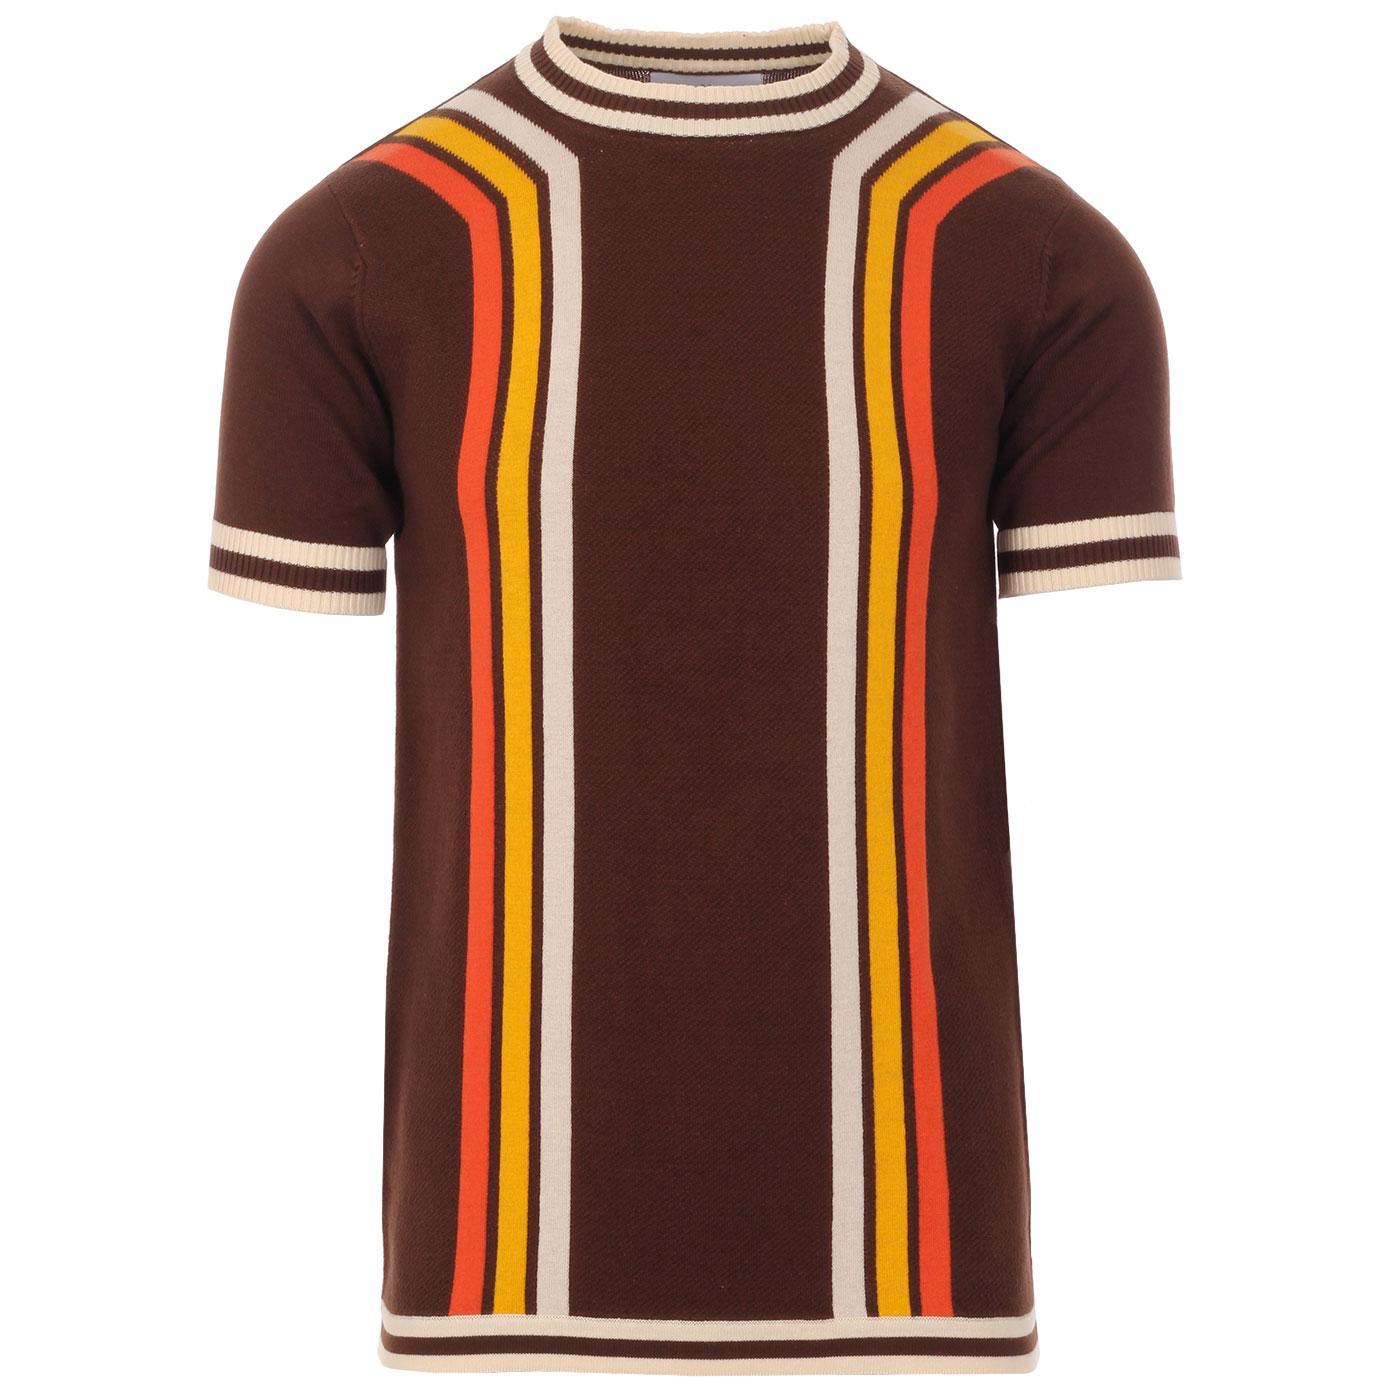 Modernista MADCAP ENGLAND Waffle Stripe T-shirt PS